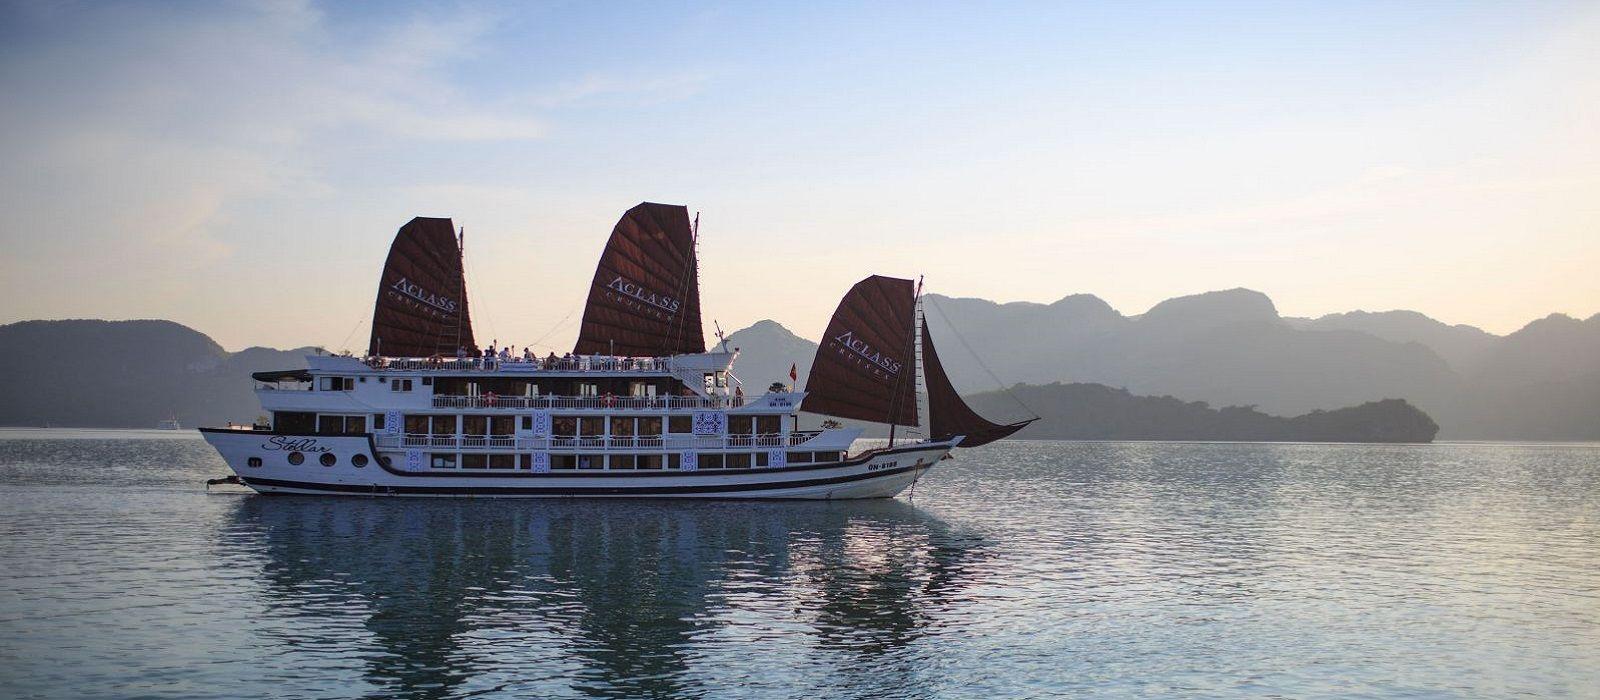 Hotel Stellar Cruise Halong Bay Vietnam